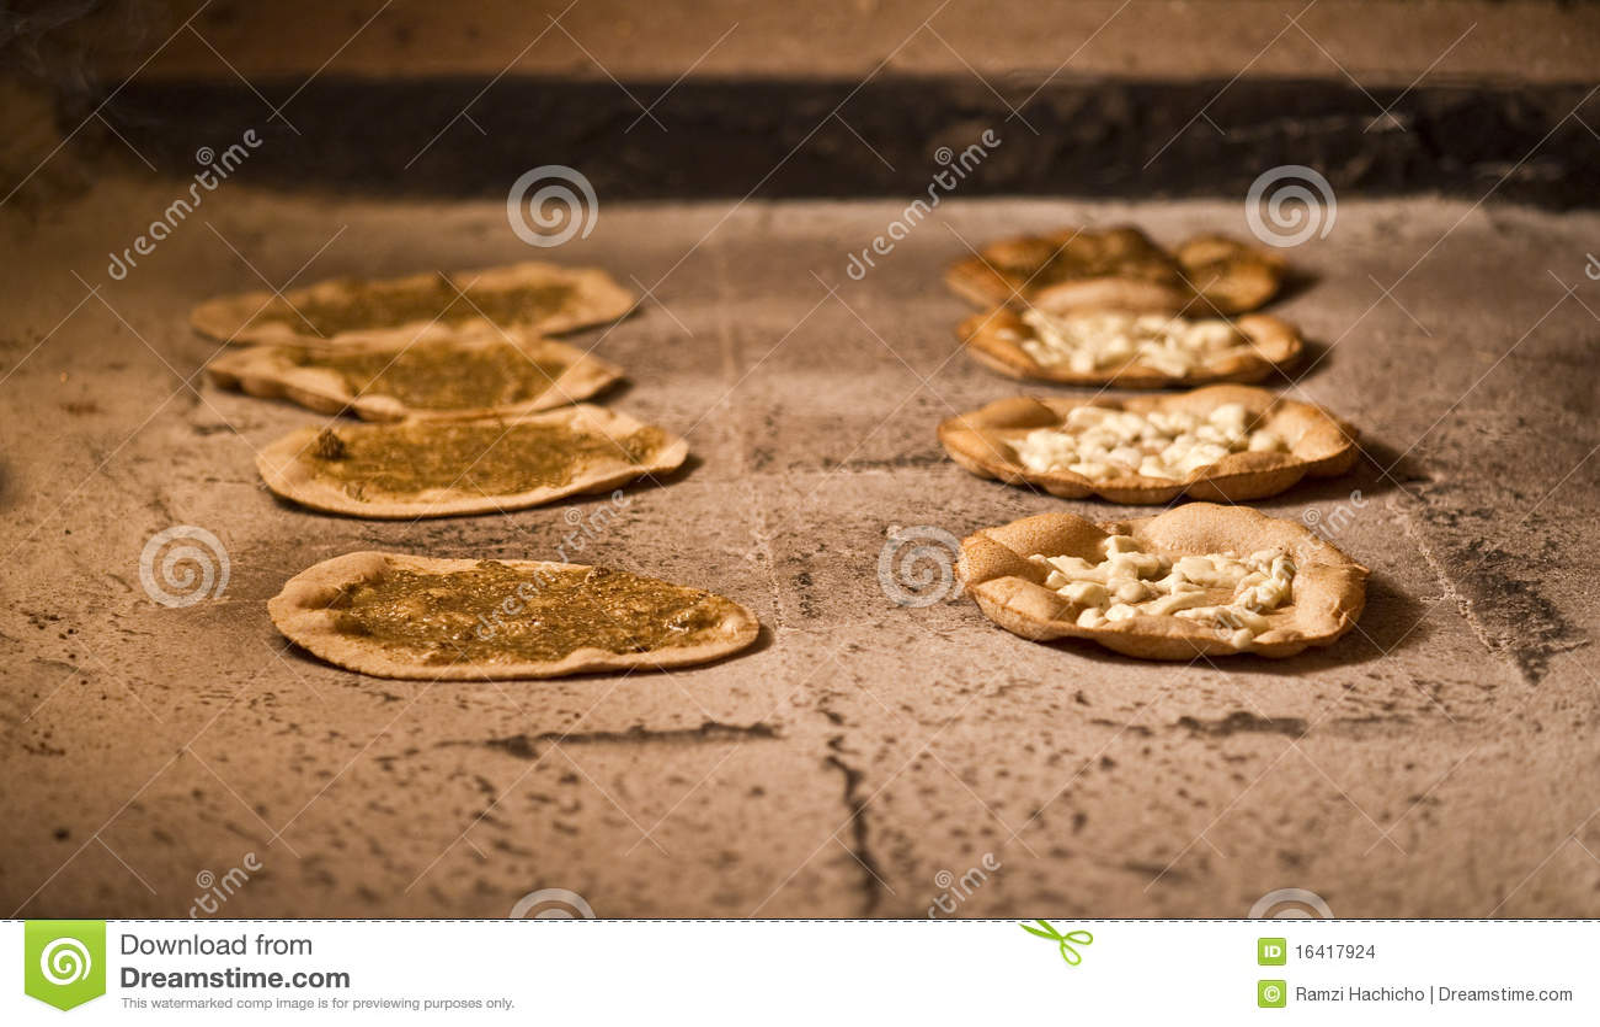 Lebanese manakish / oriental food for breakfast ba